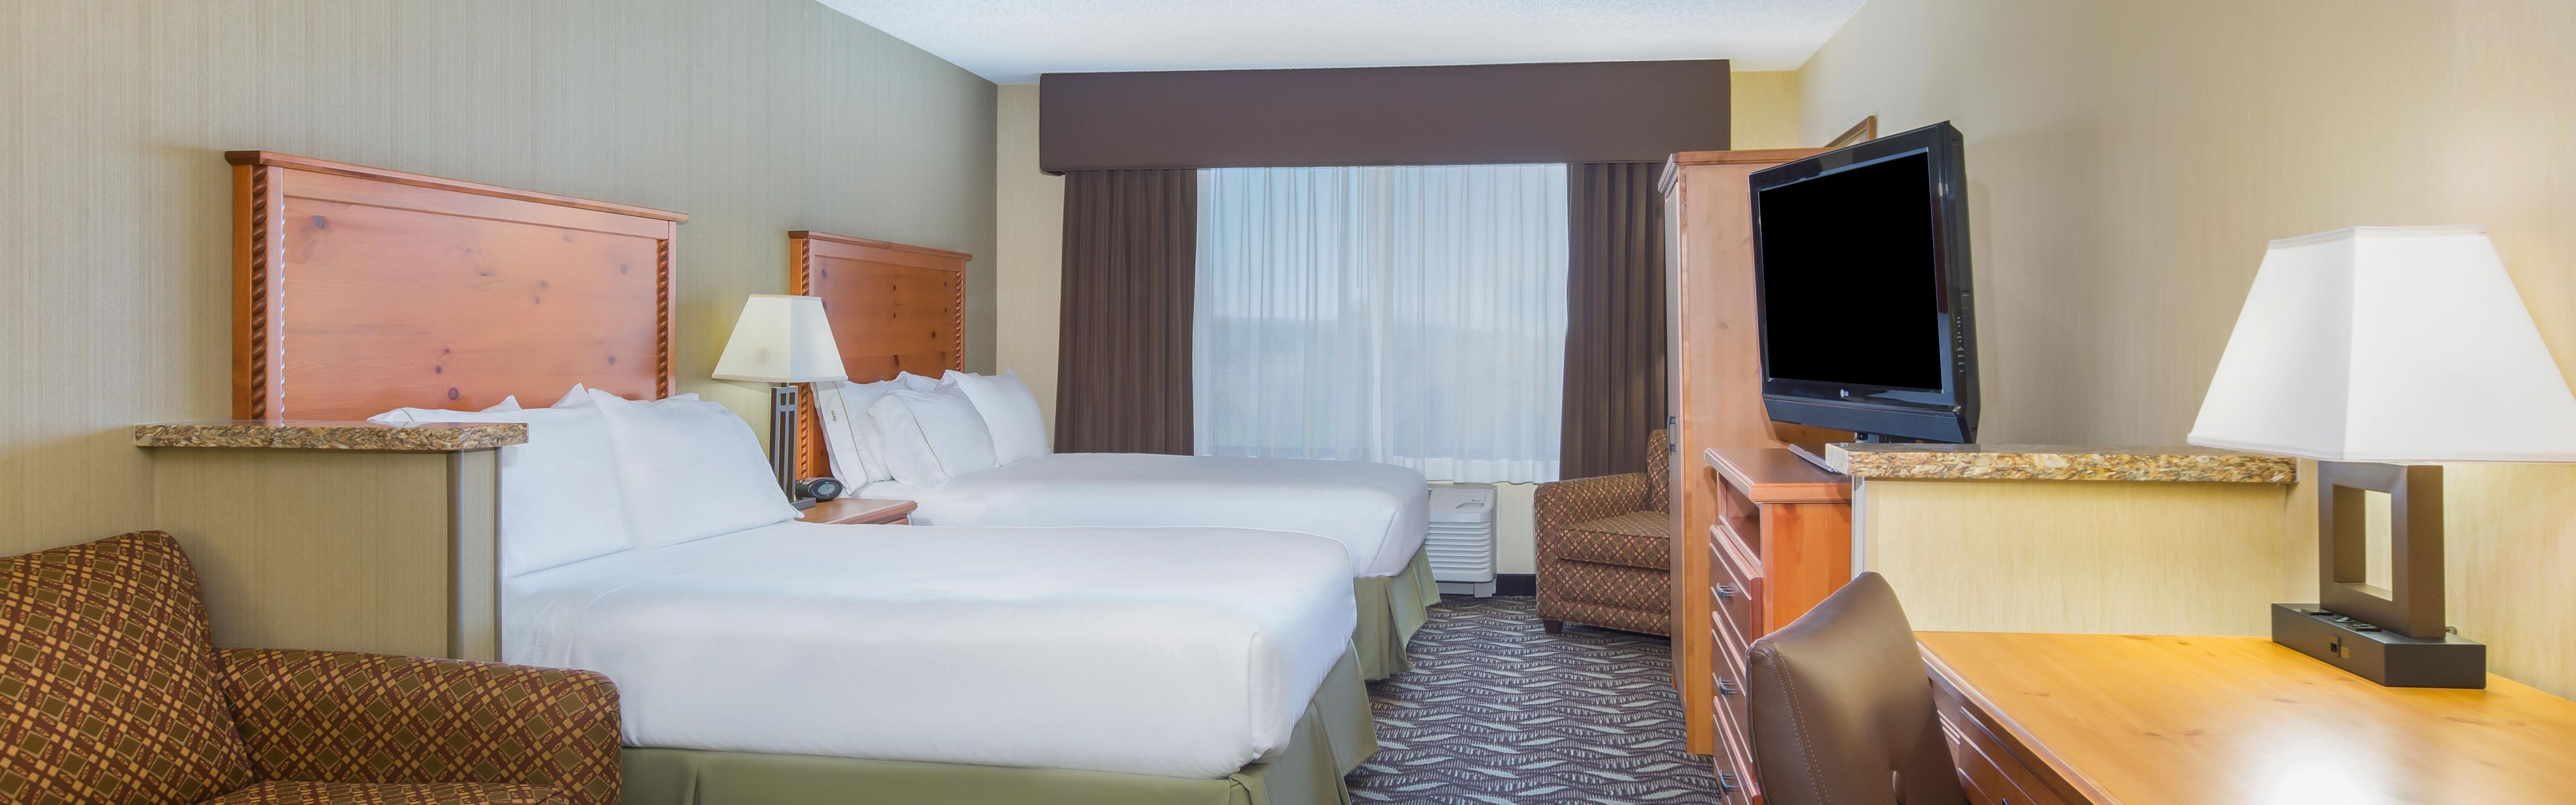 Holiday Inn Express Billings East image 1